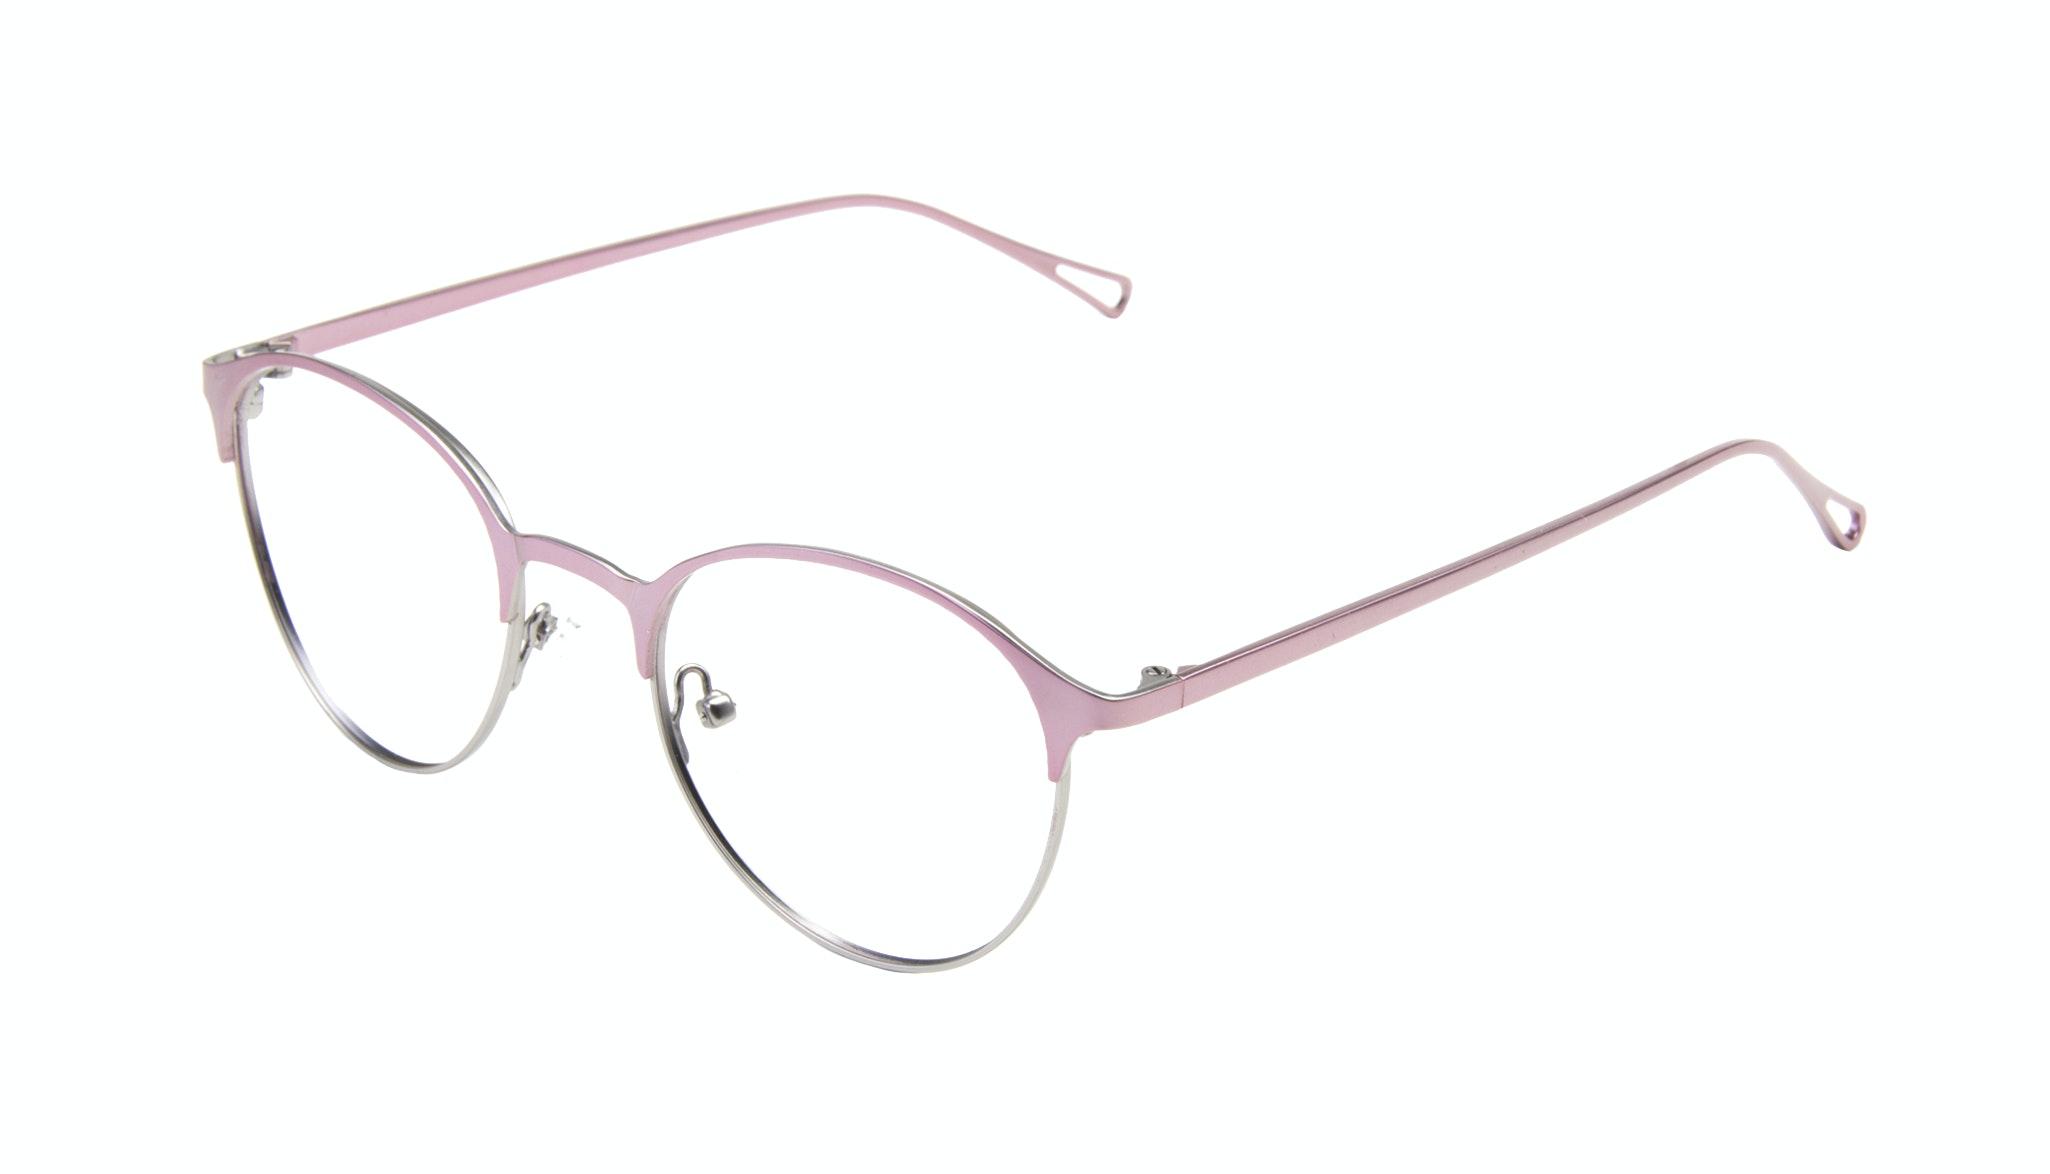 Affordable Fashion Glasses Round Eyeglasses Women Bay Shell Tilt